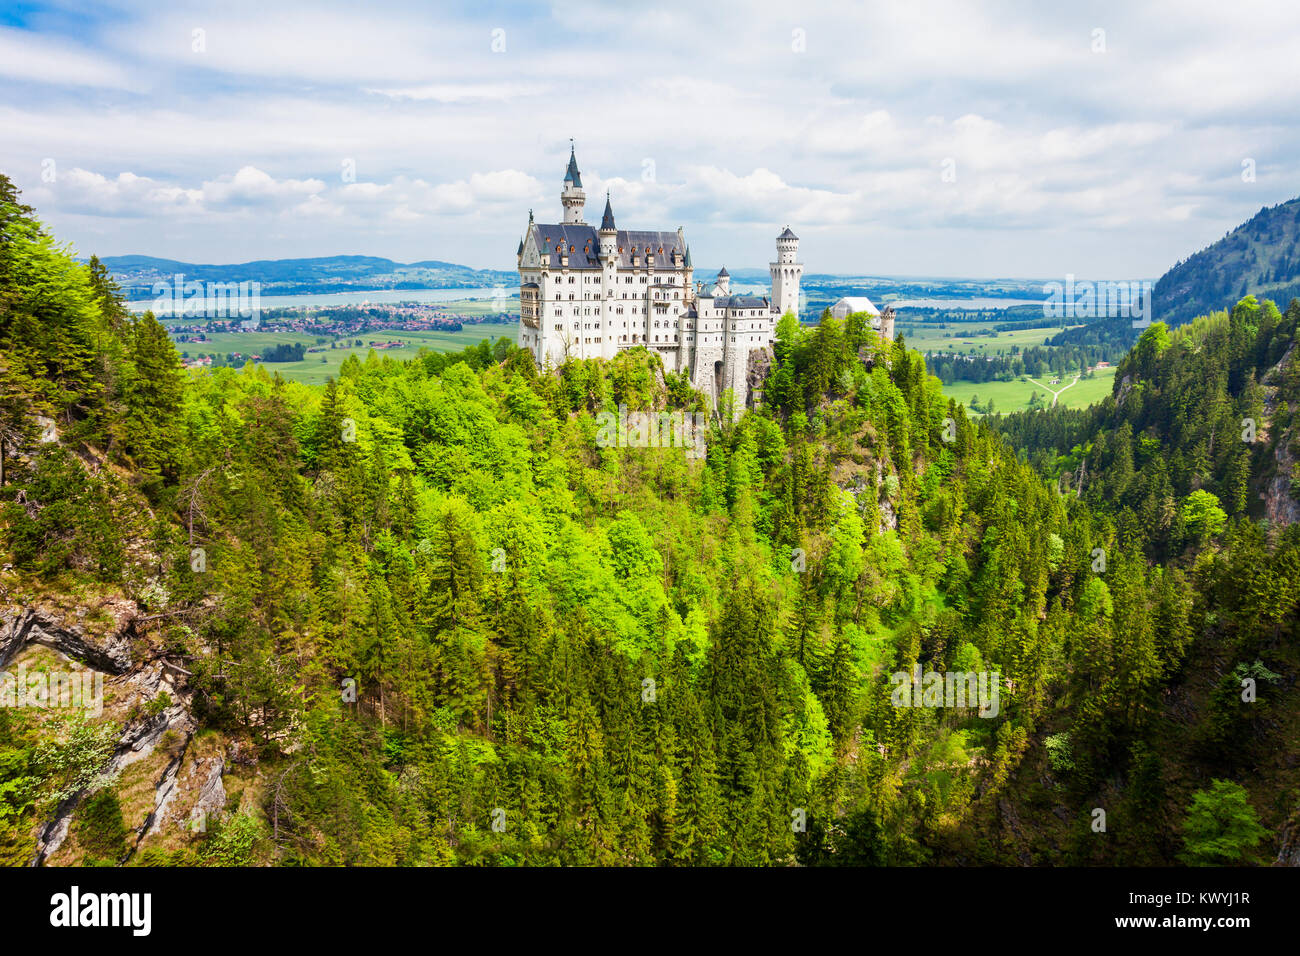 Schloss Neuschwanstein Castle or New Swanstone Castle is a Romanesque Revival palace in Hohenschwangau village near - Stock Image